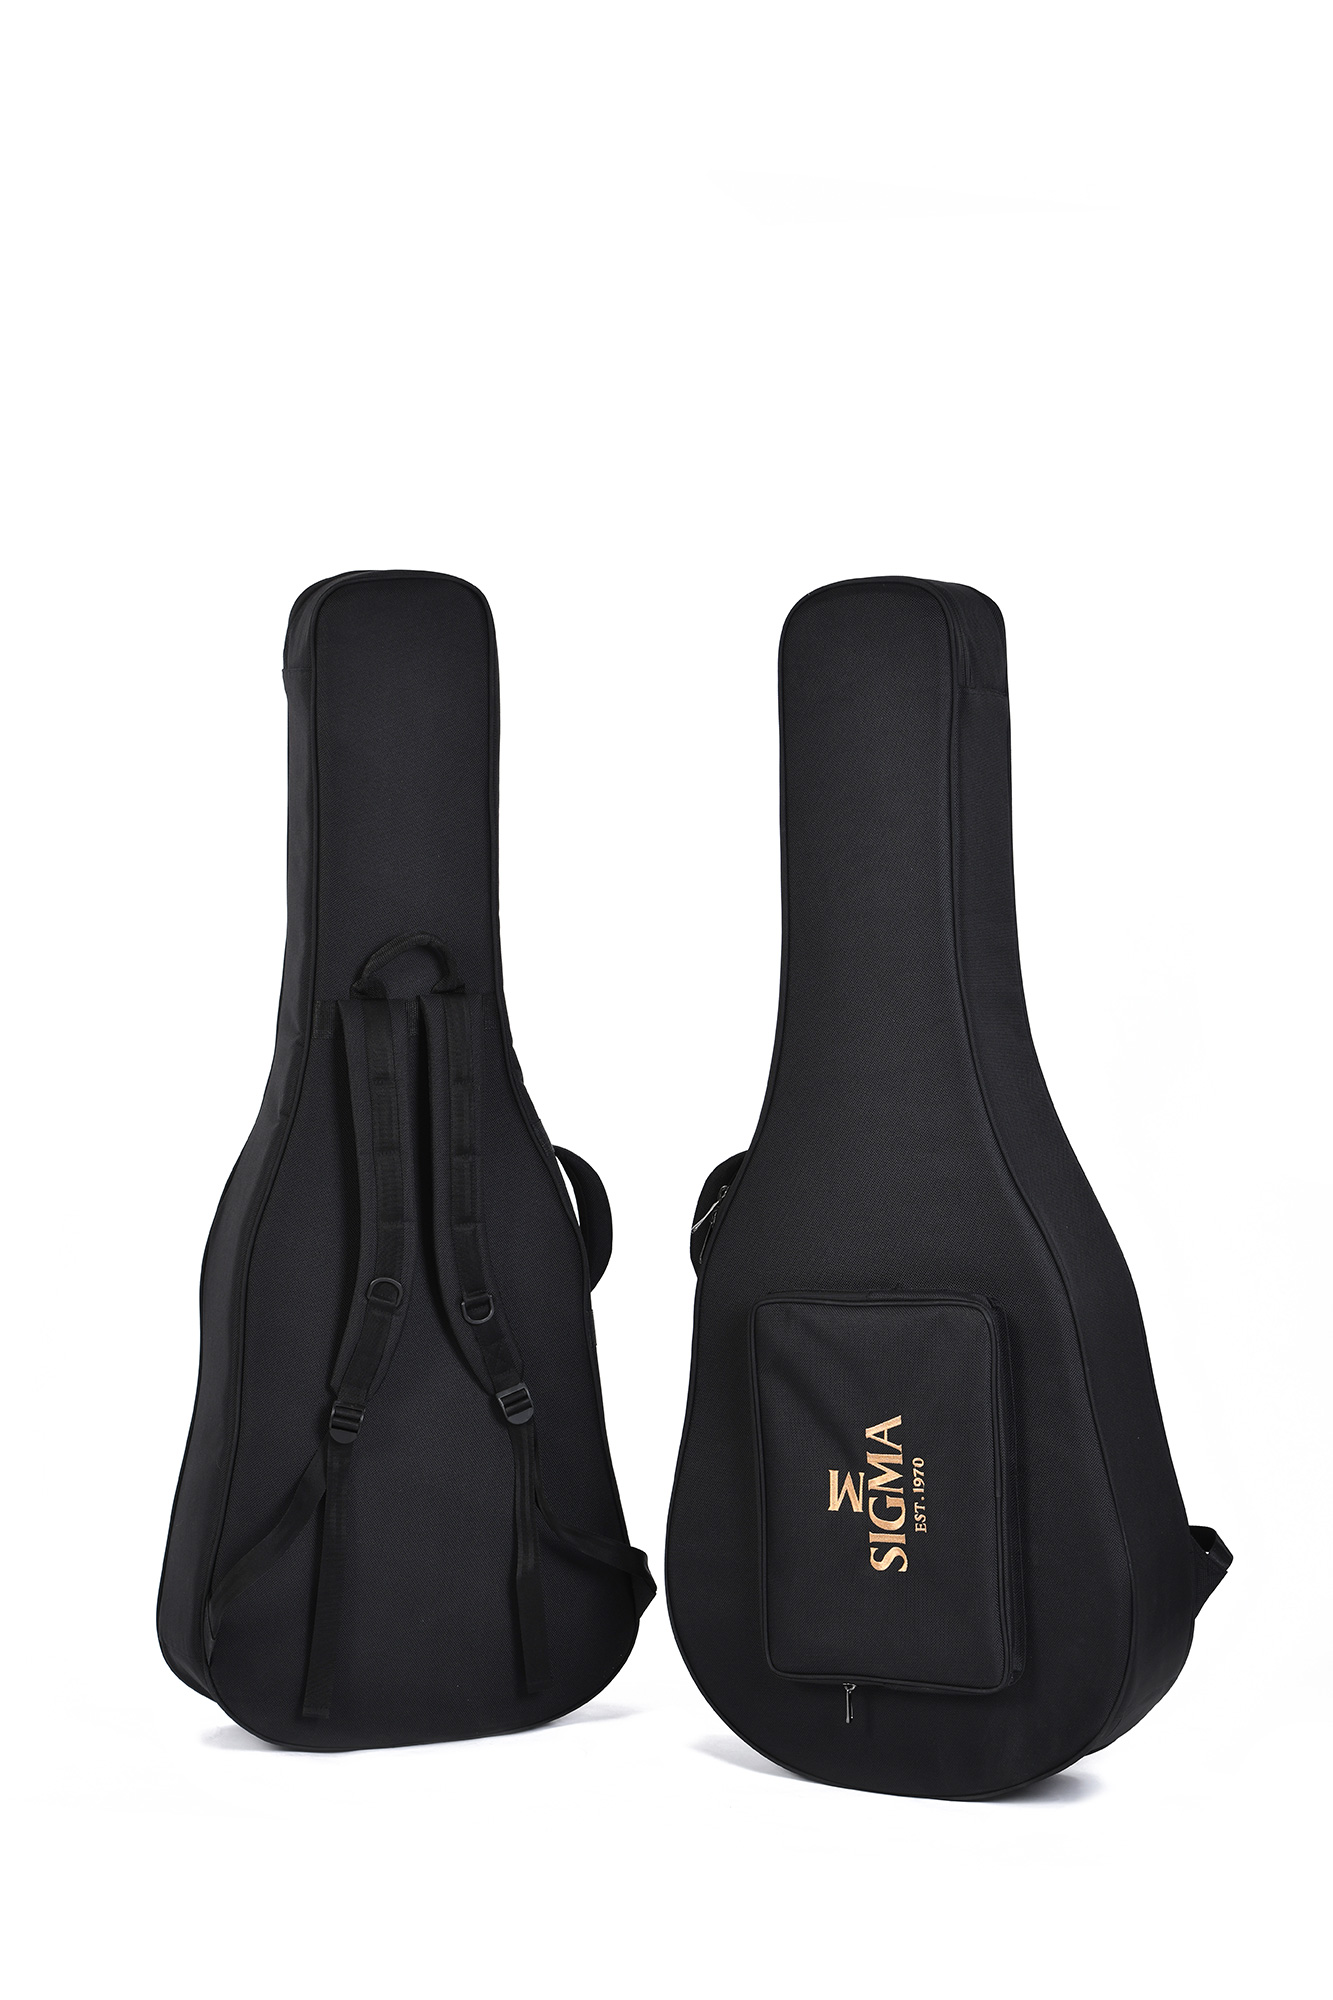 SIGMA S000R-42S Costom Westerngitarre inkl. Softshell Case